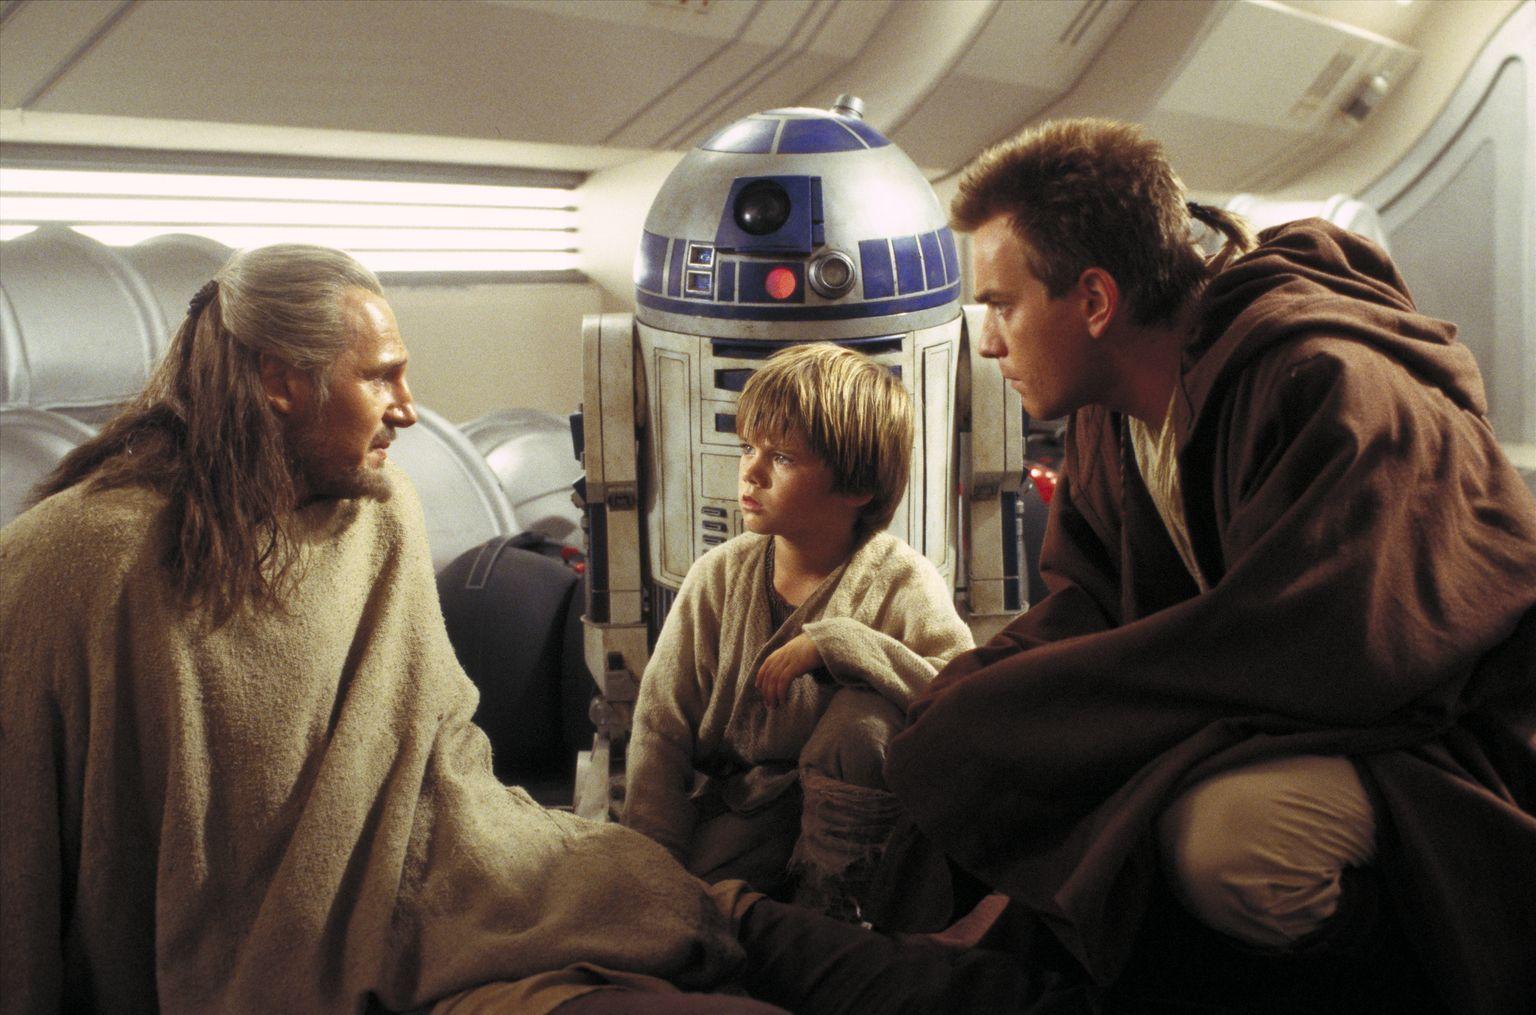 "From left: Qui-Gon Jinn (Liam Neeson), Anakin Skywalker (Jake Lloyd) and Obi-Wan Kenobi (Ewan McGregor) appear in a scene from ""Star Wars Episode I: The Phantom Menace."""